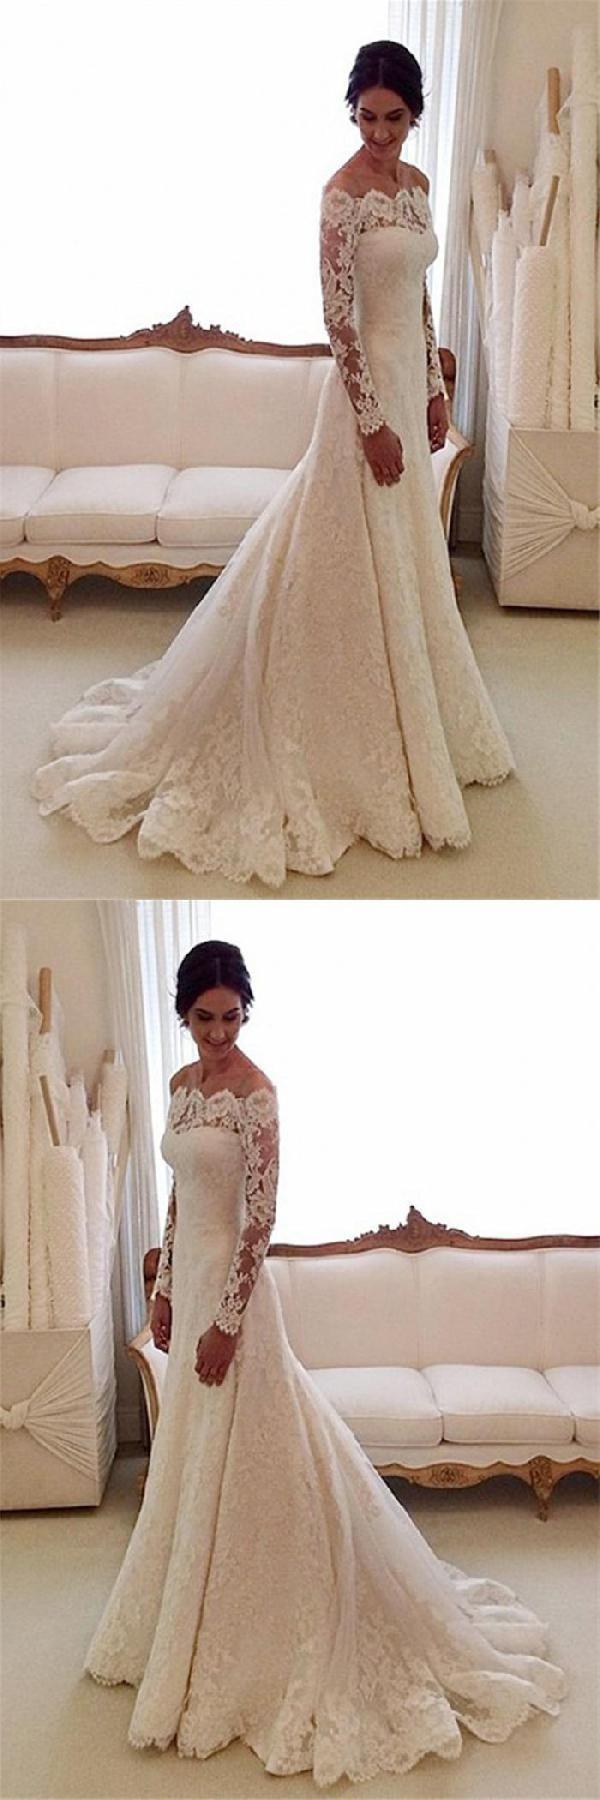 Long sleeves wedding dress white wedding dress wedding dress